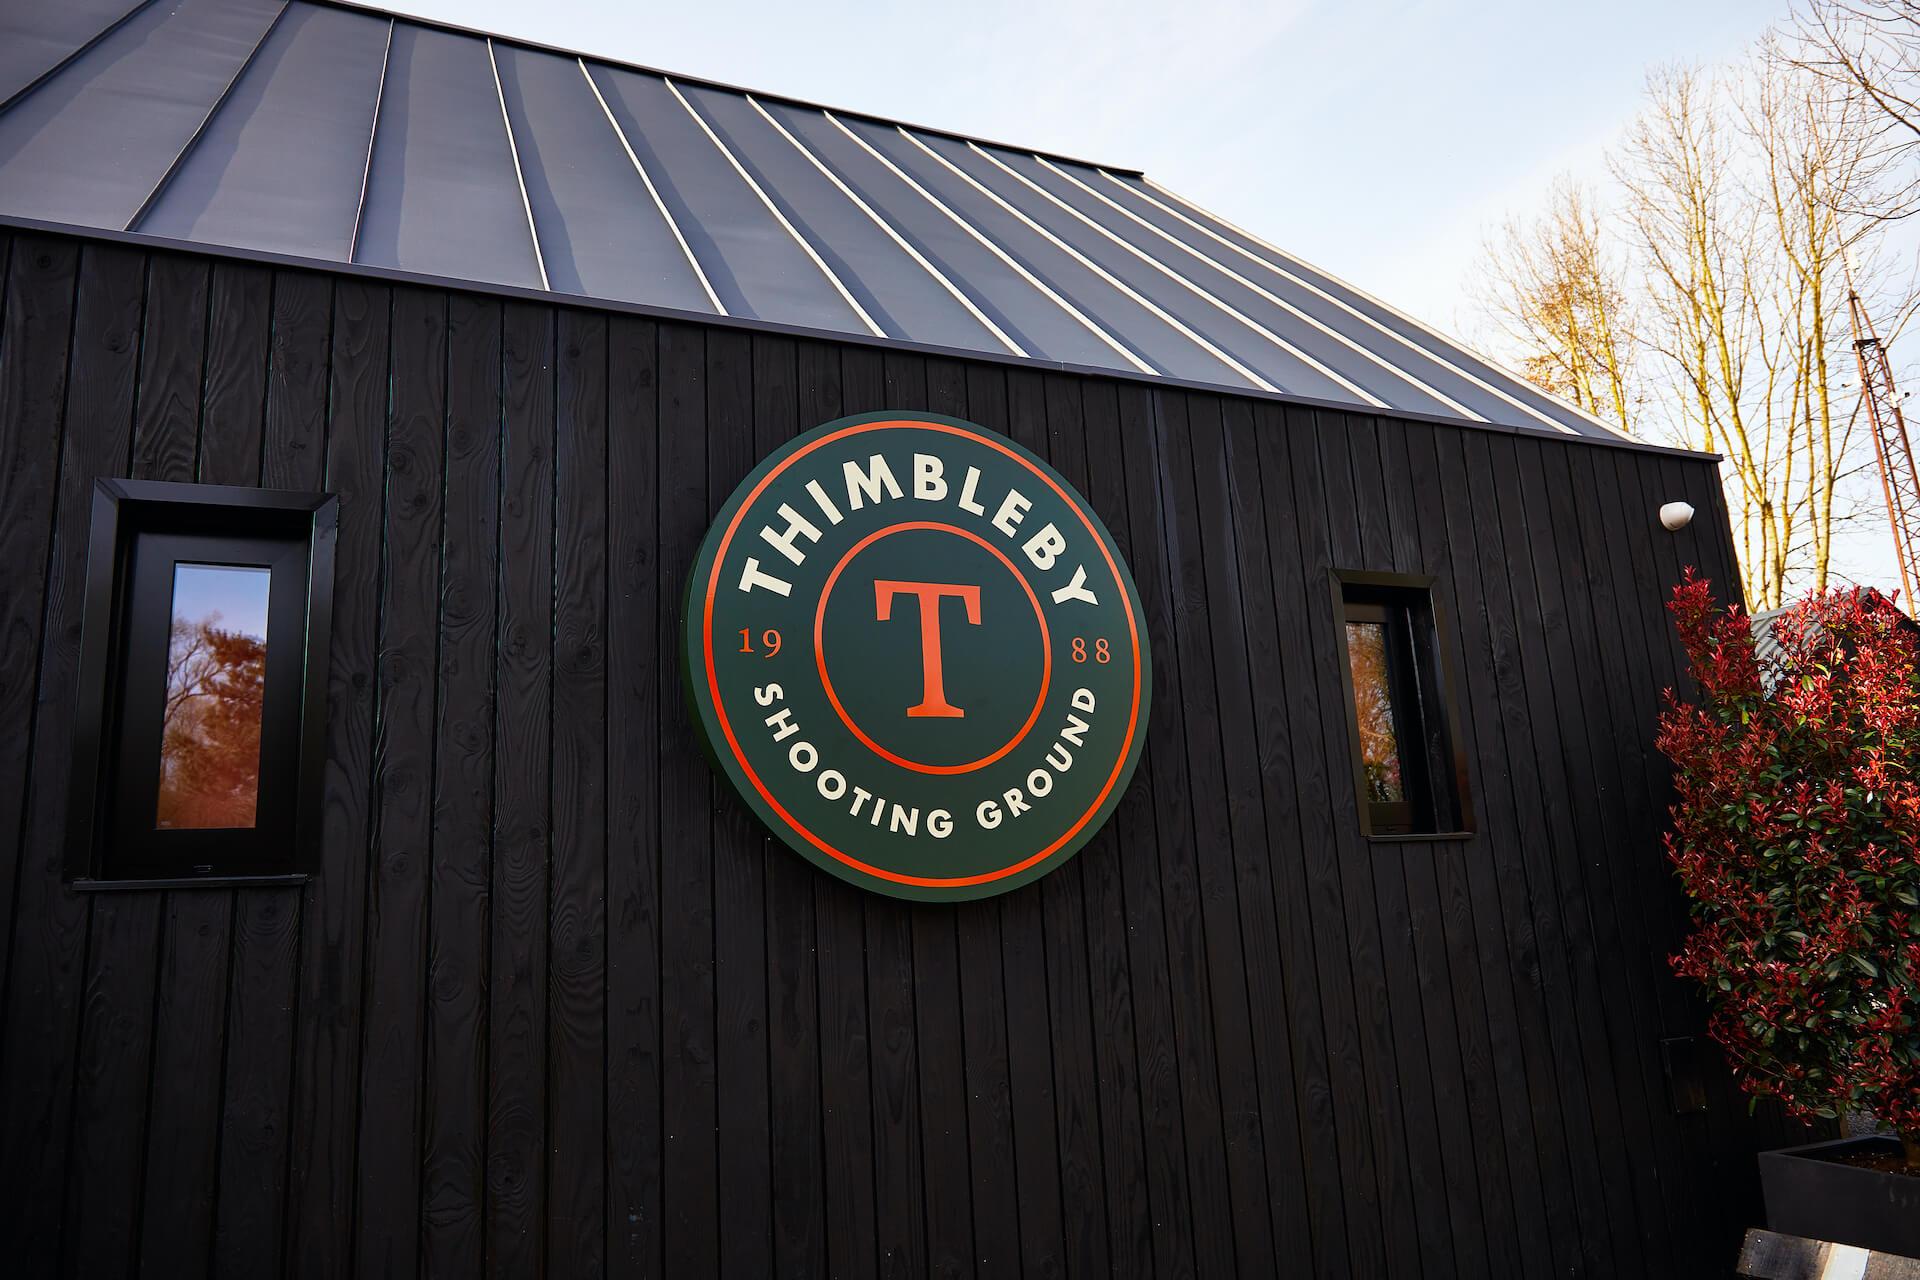 thimbleby shooting ground 3